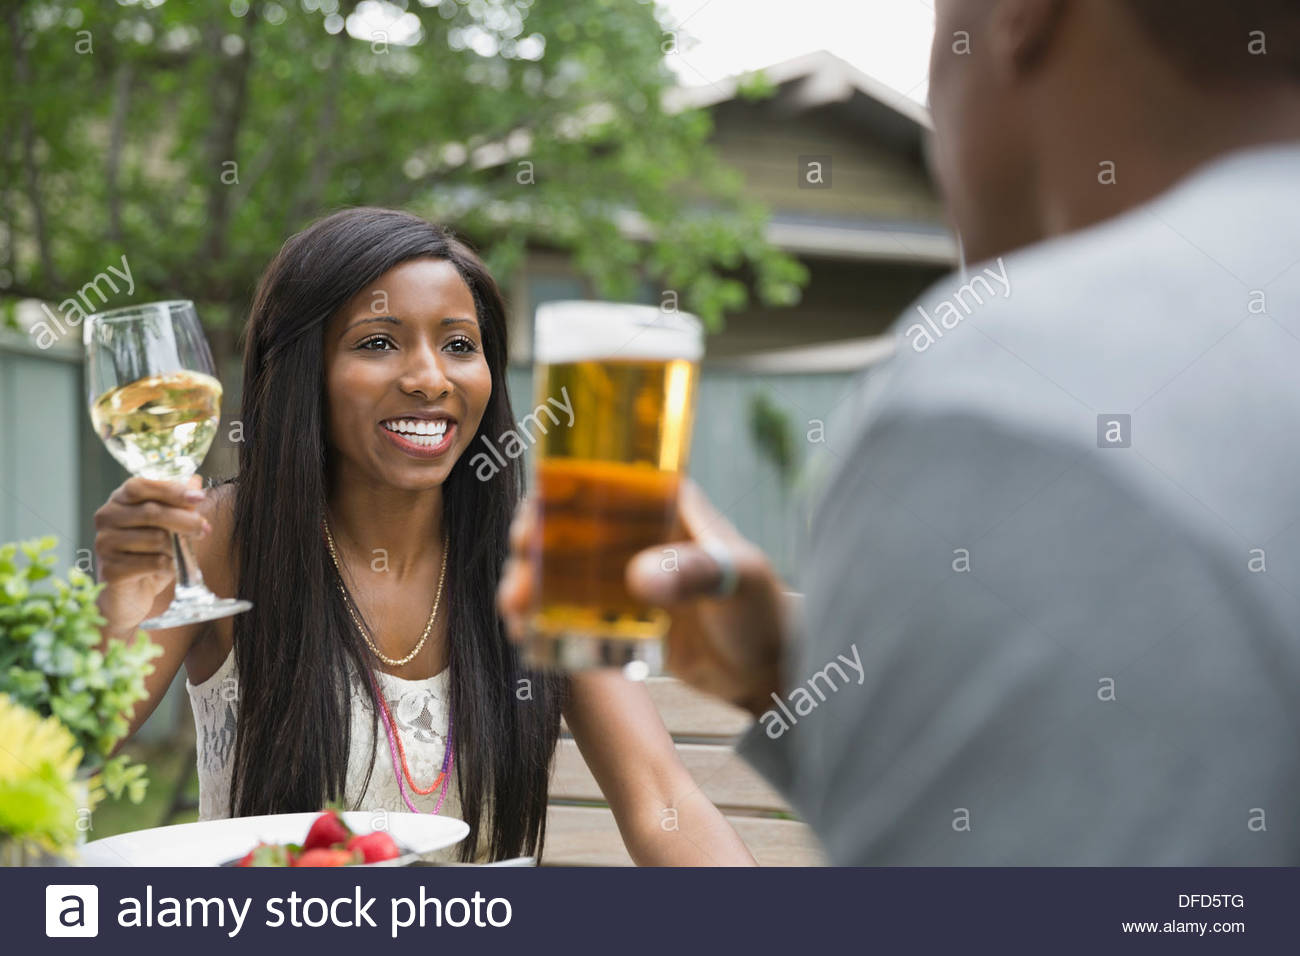 Cheerful couple enjoying a drink in backyard - Stock Image